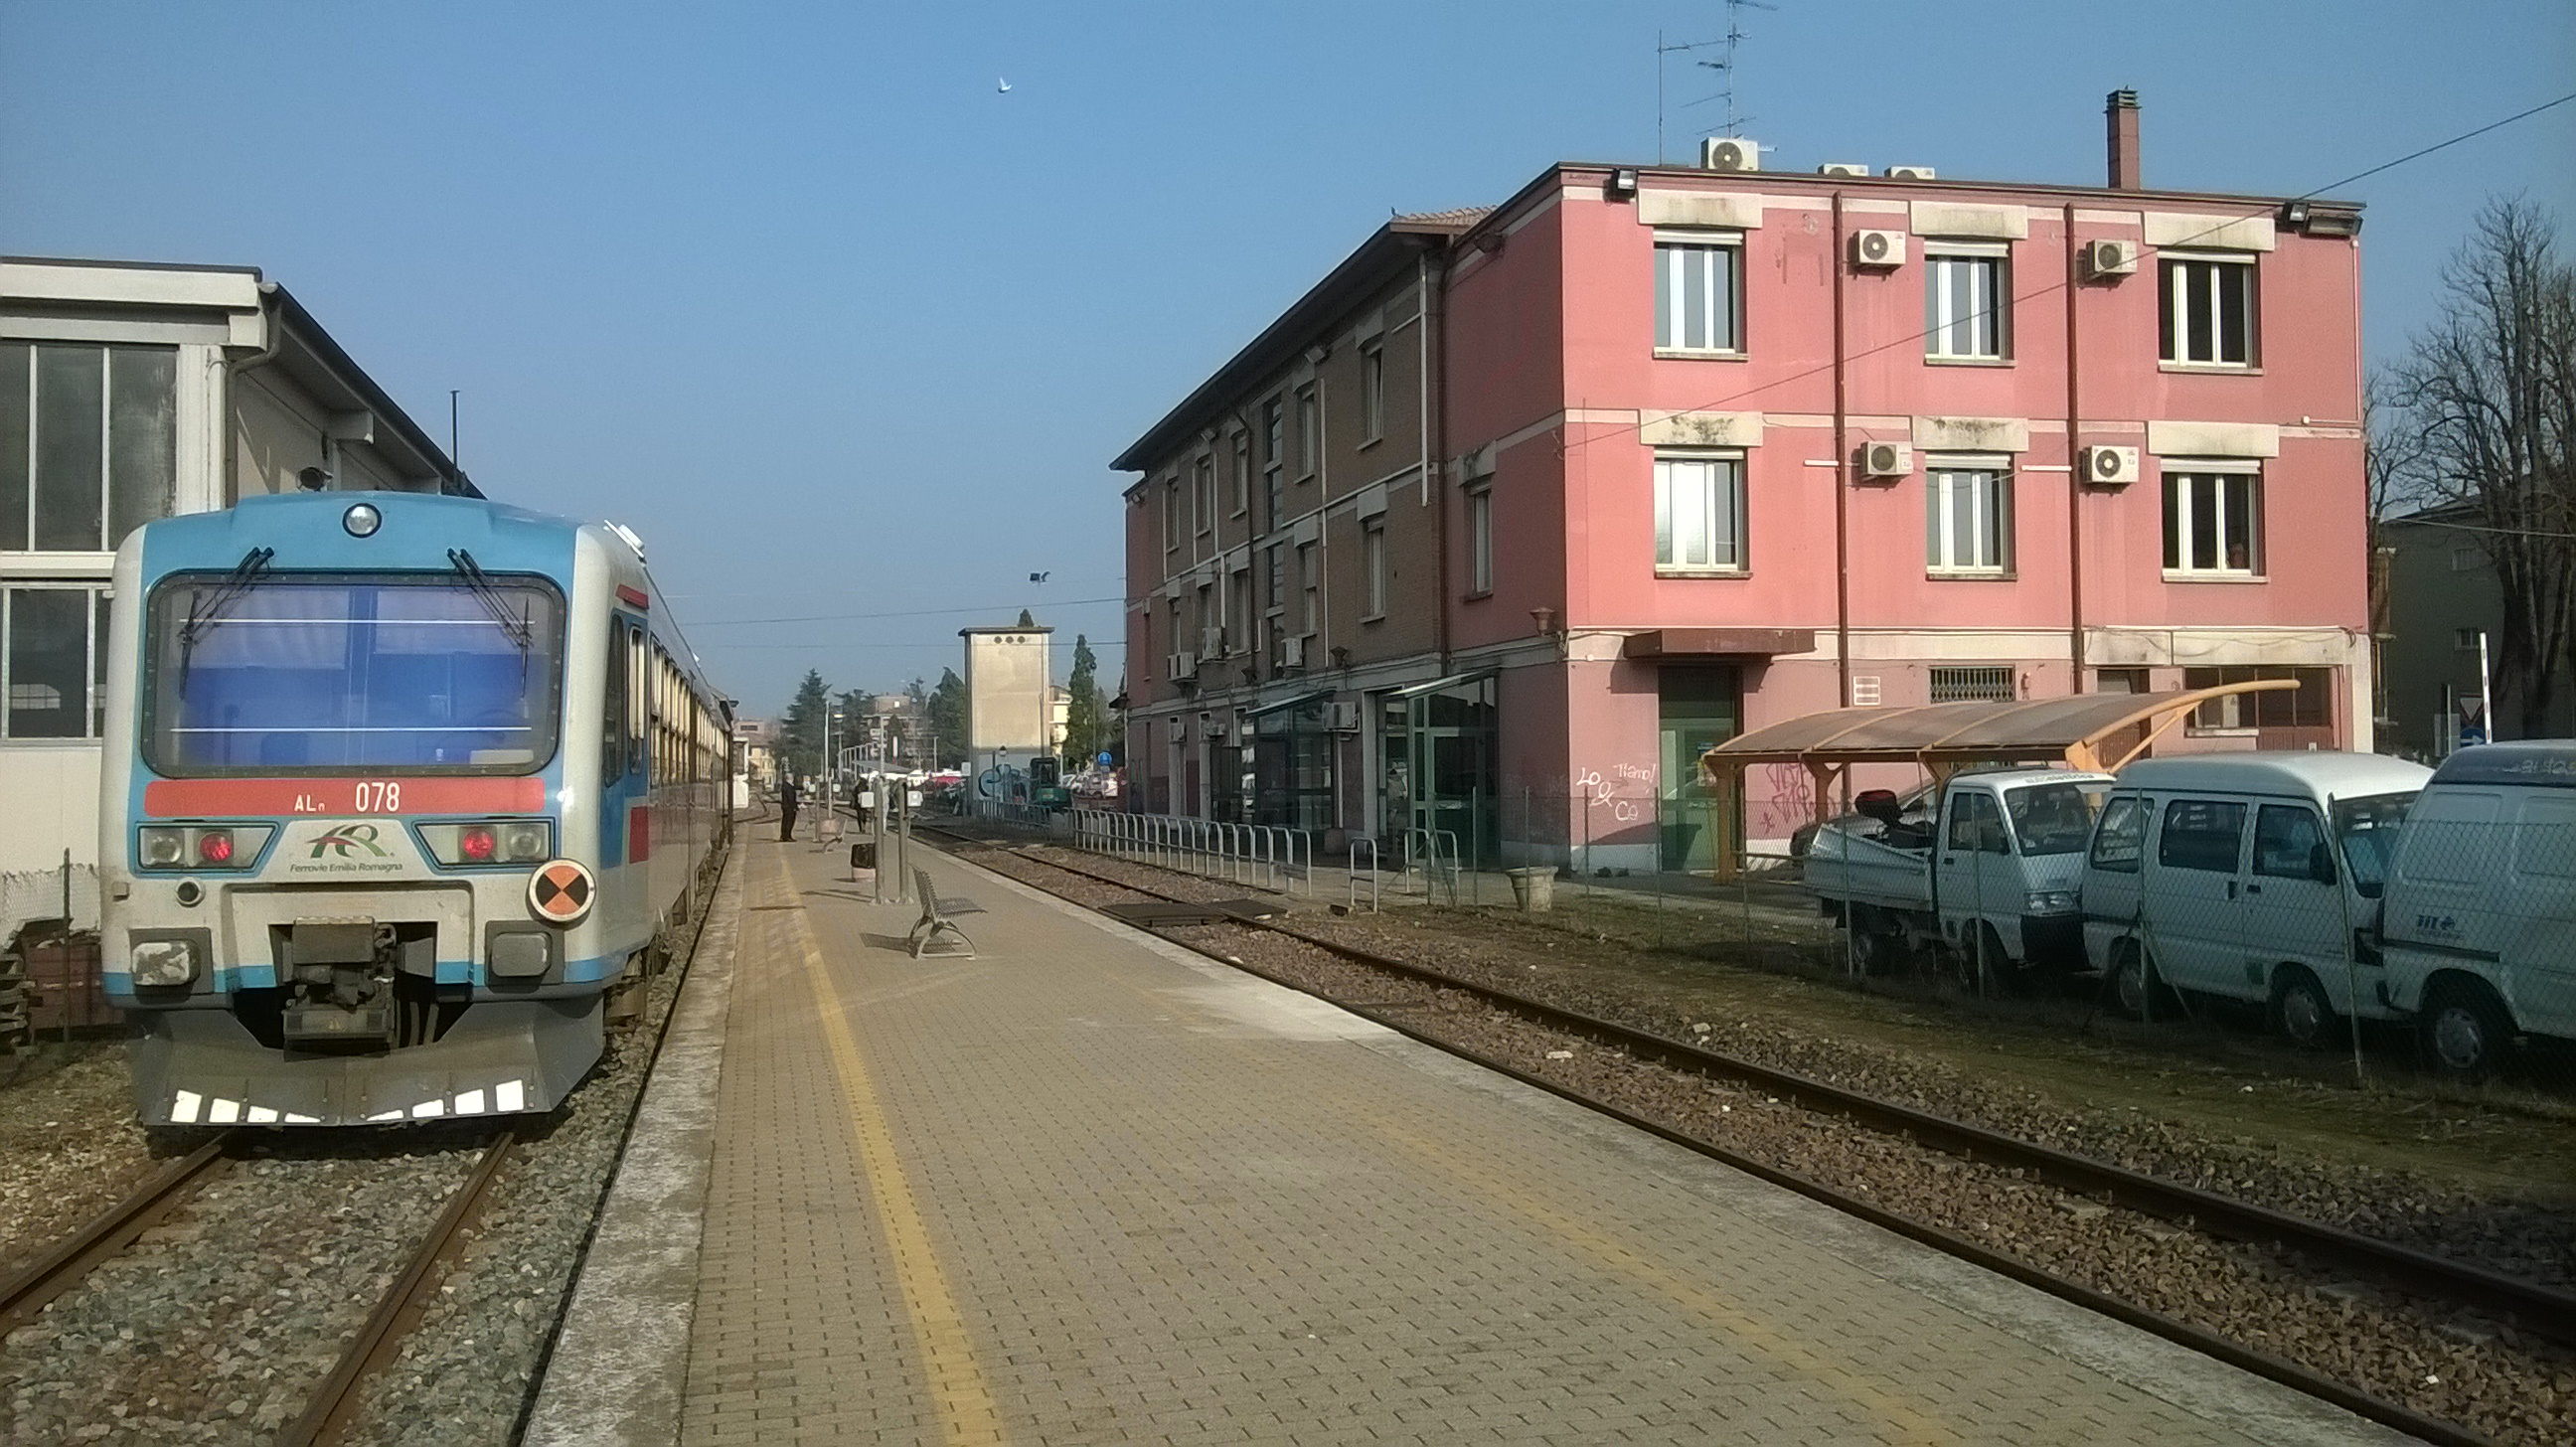 Reggio emilia ciano d enza fer ferrovie emilia romagna for Bagnoli s r l reggio emilia re